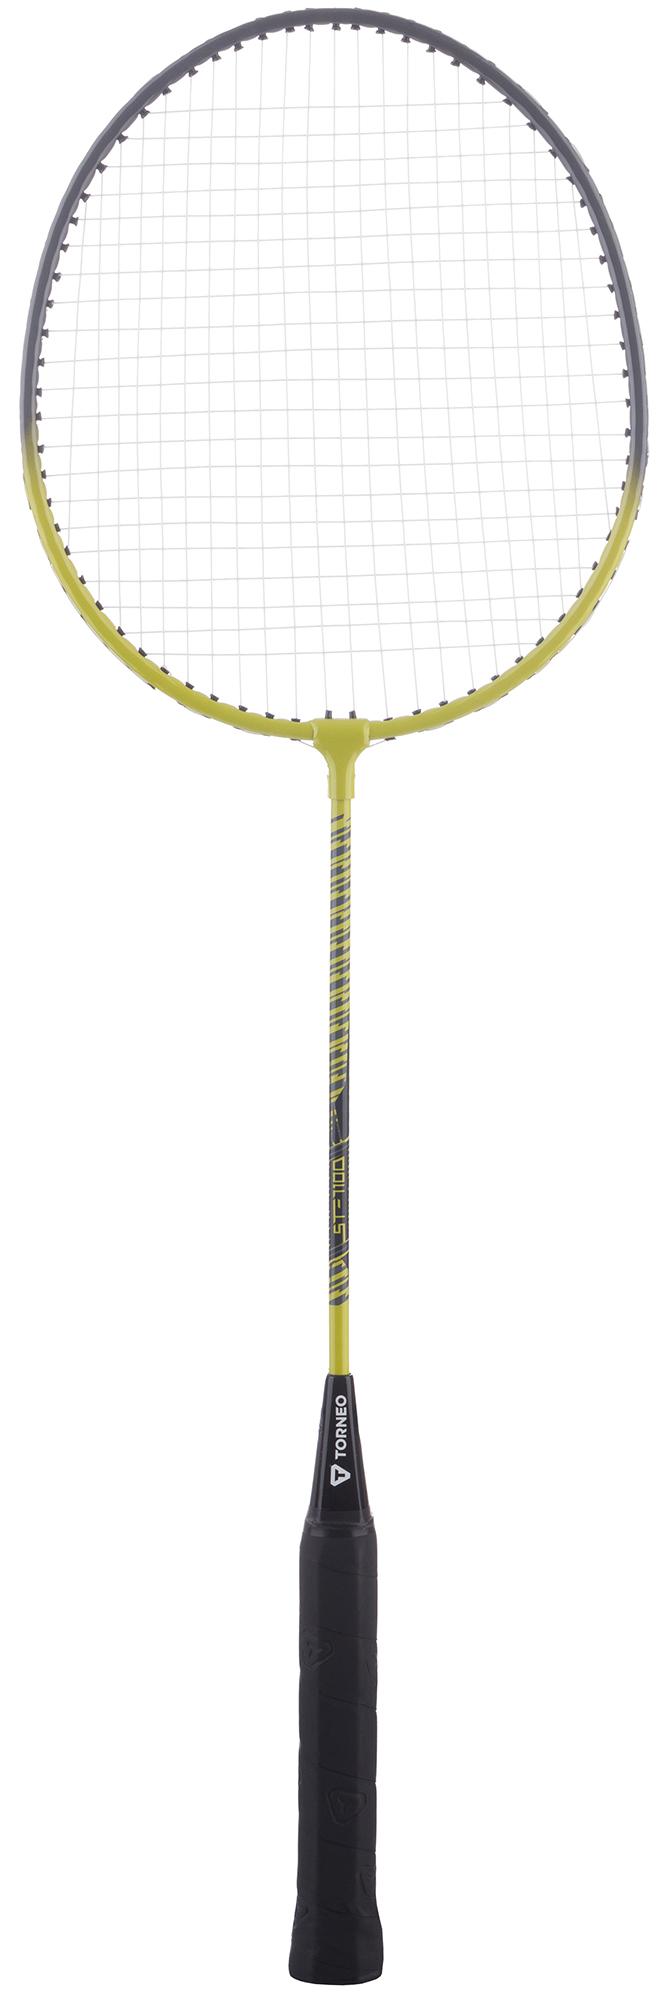 Torneo Ракетка для бадминтона Torneo ракетка для бадминтона sirdar 2020 x